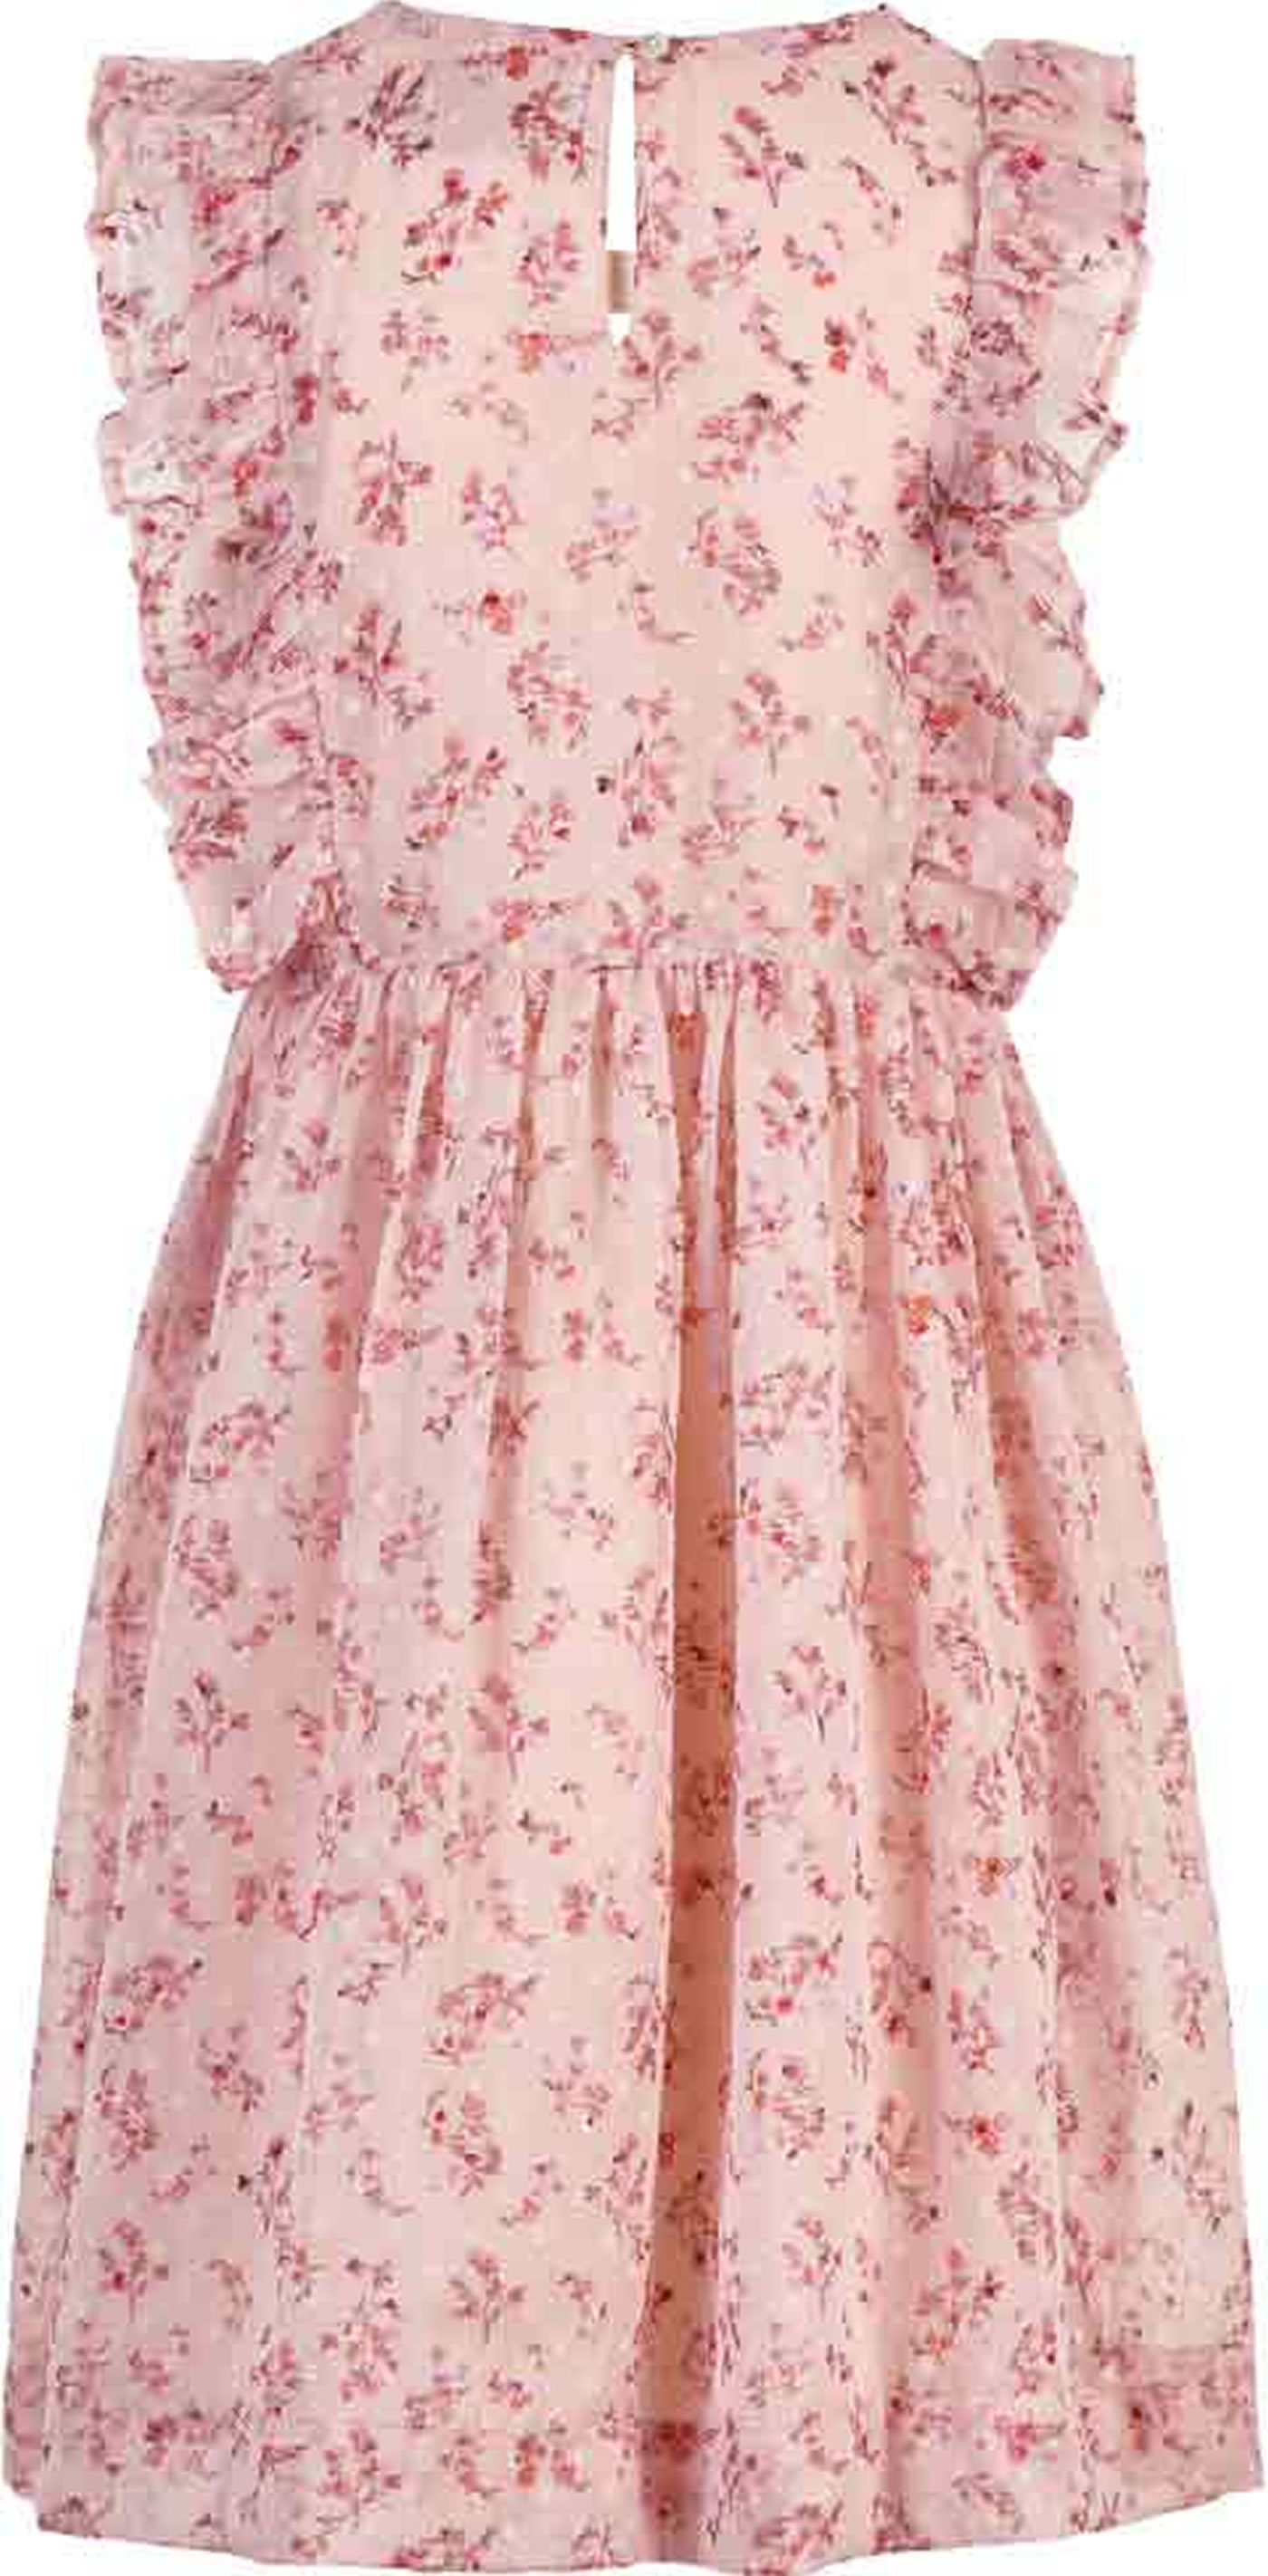 Creamie Dress Chiffon ROSE DOBBY rose smoke 16-16